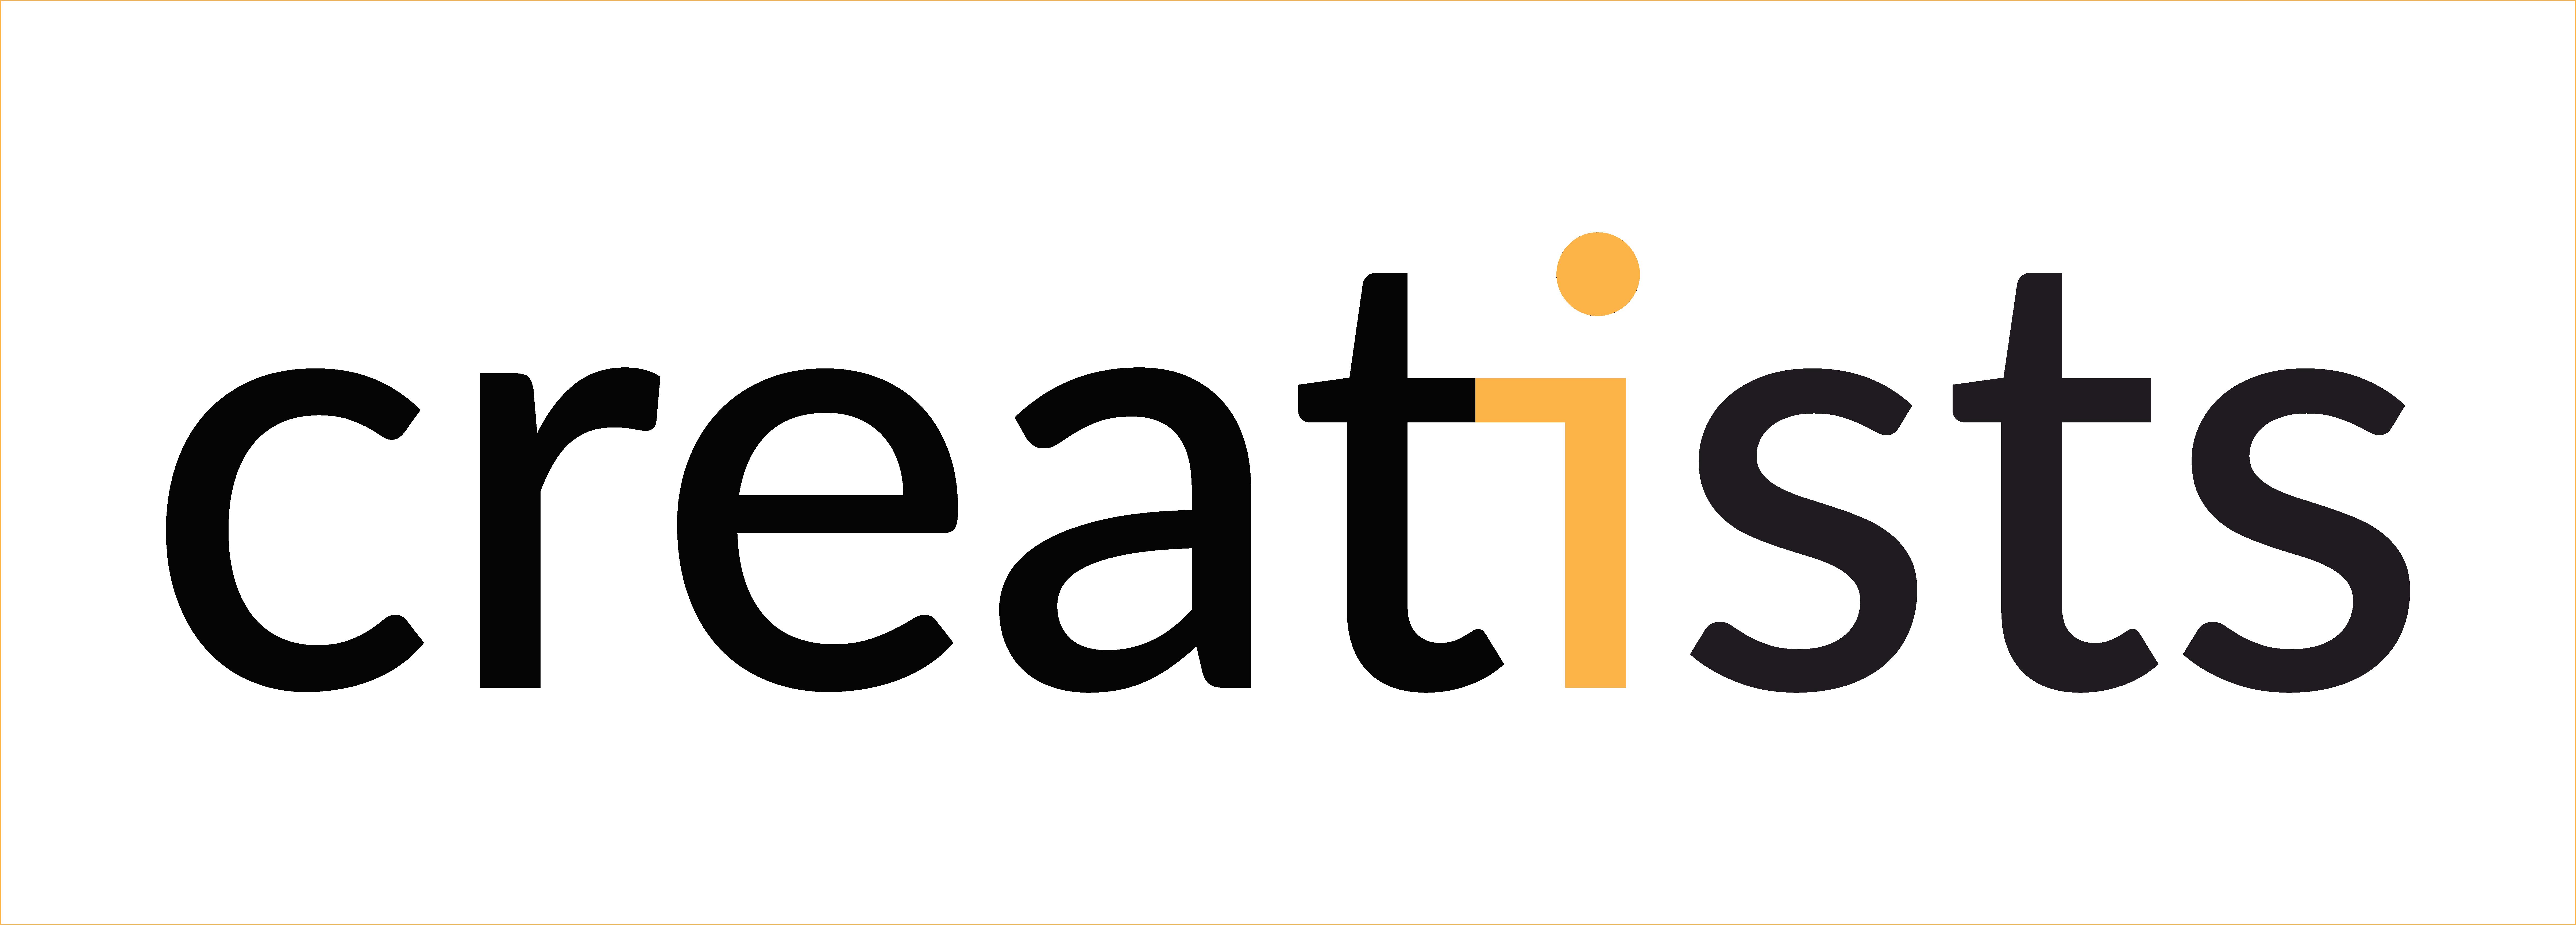 creatists-logo-7